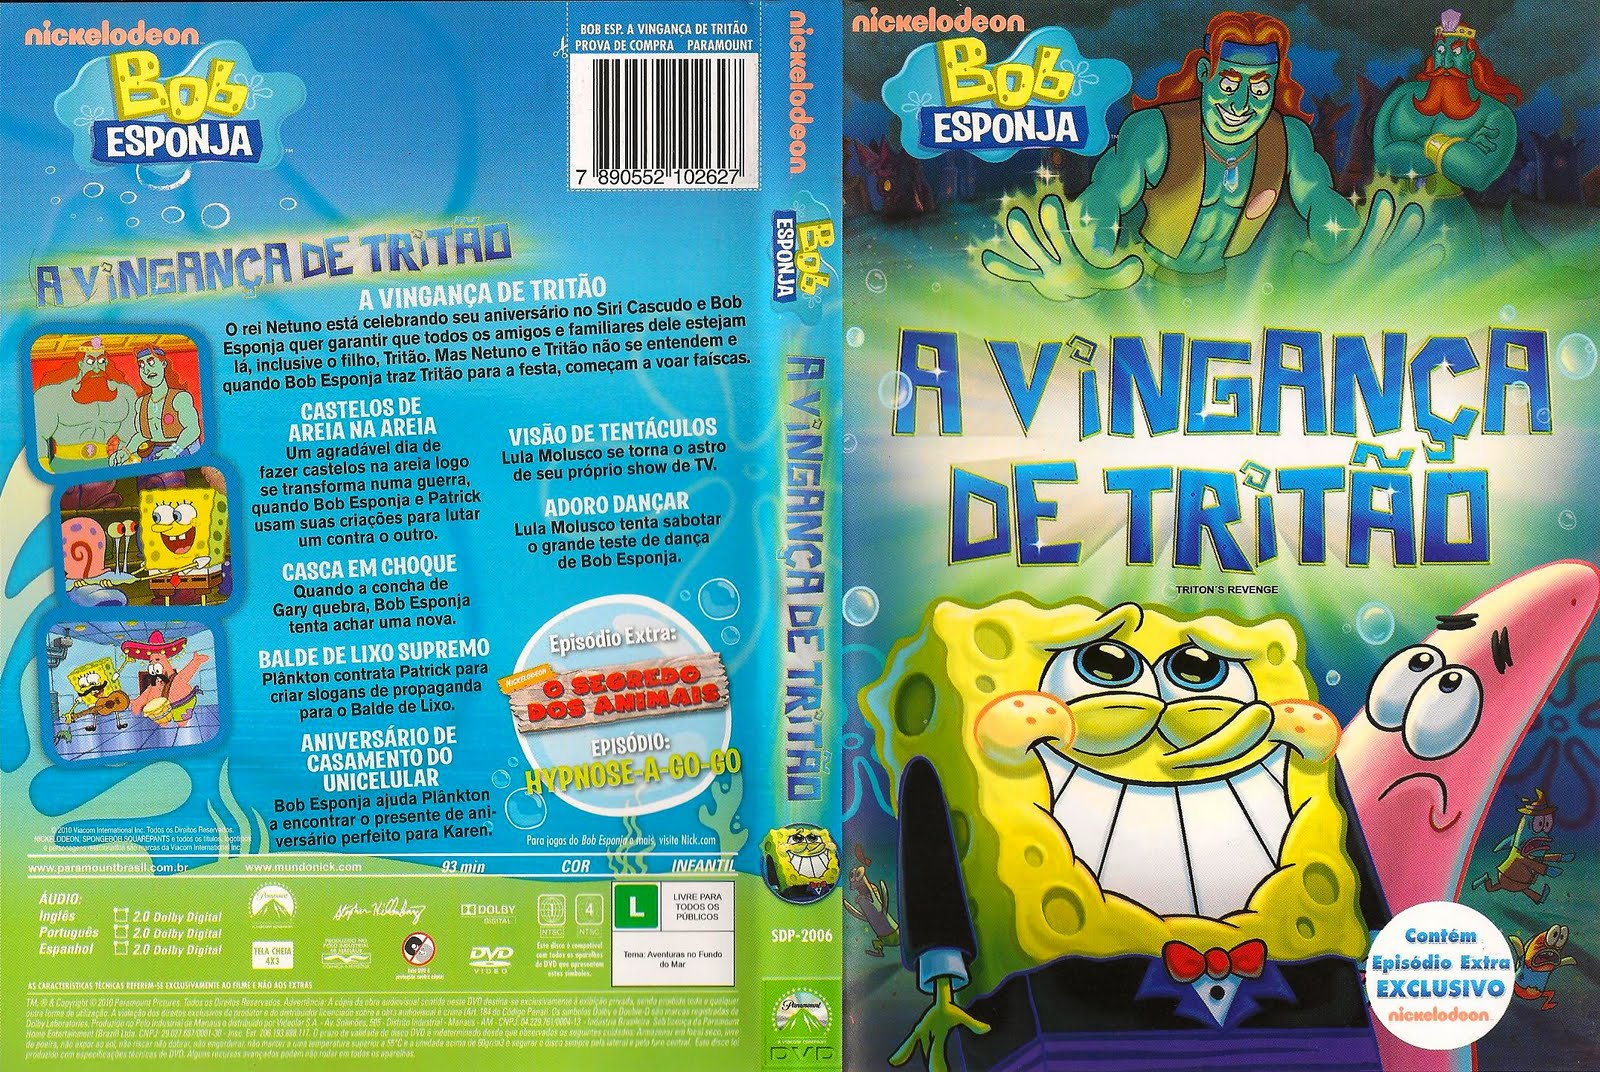 Ver Pelicula Bob Esponja: Un héroe fuera del agua (2015) [DVD-Rip] online.  Ver The SpongeBob Movie: Sponge Out of Water (2015) espanol latino online  gratis.